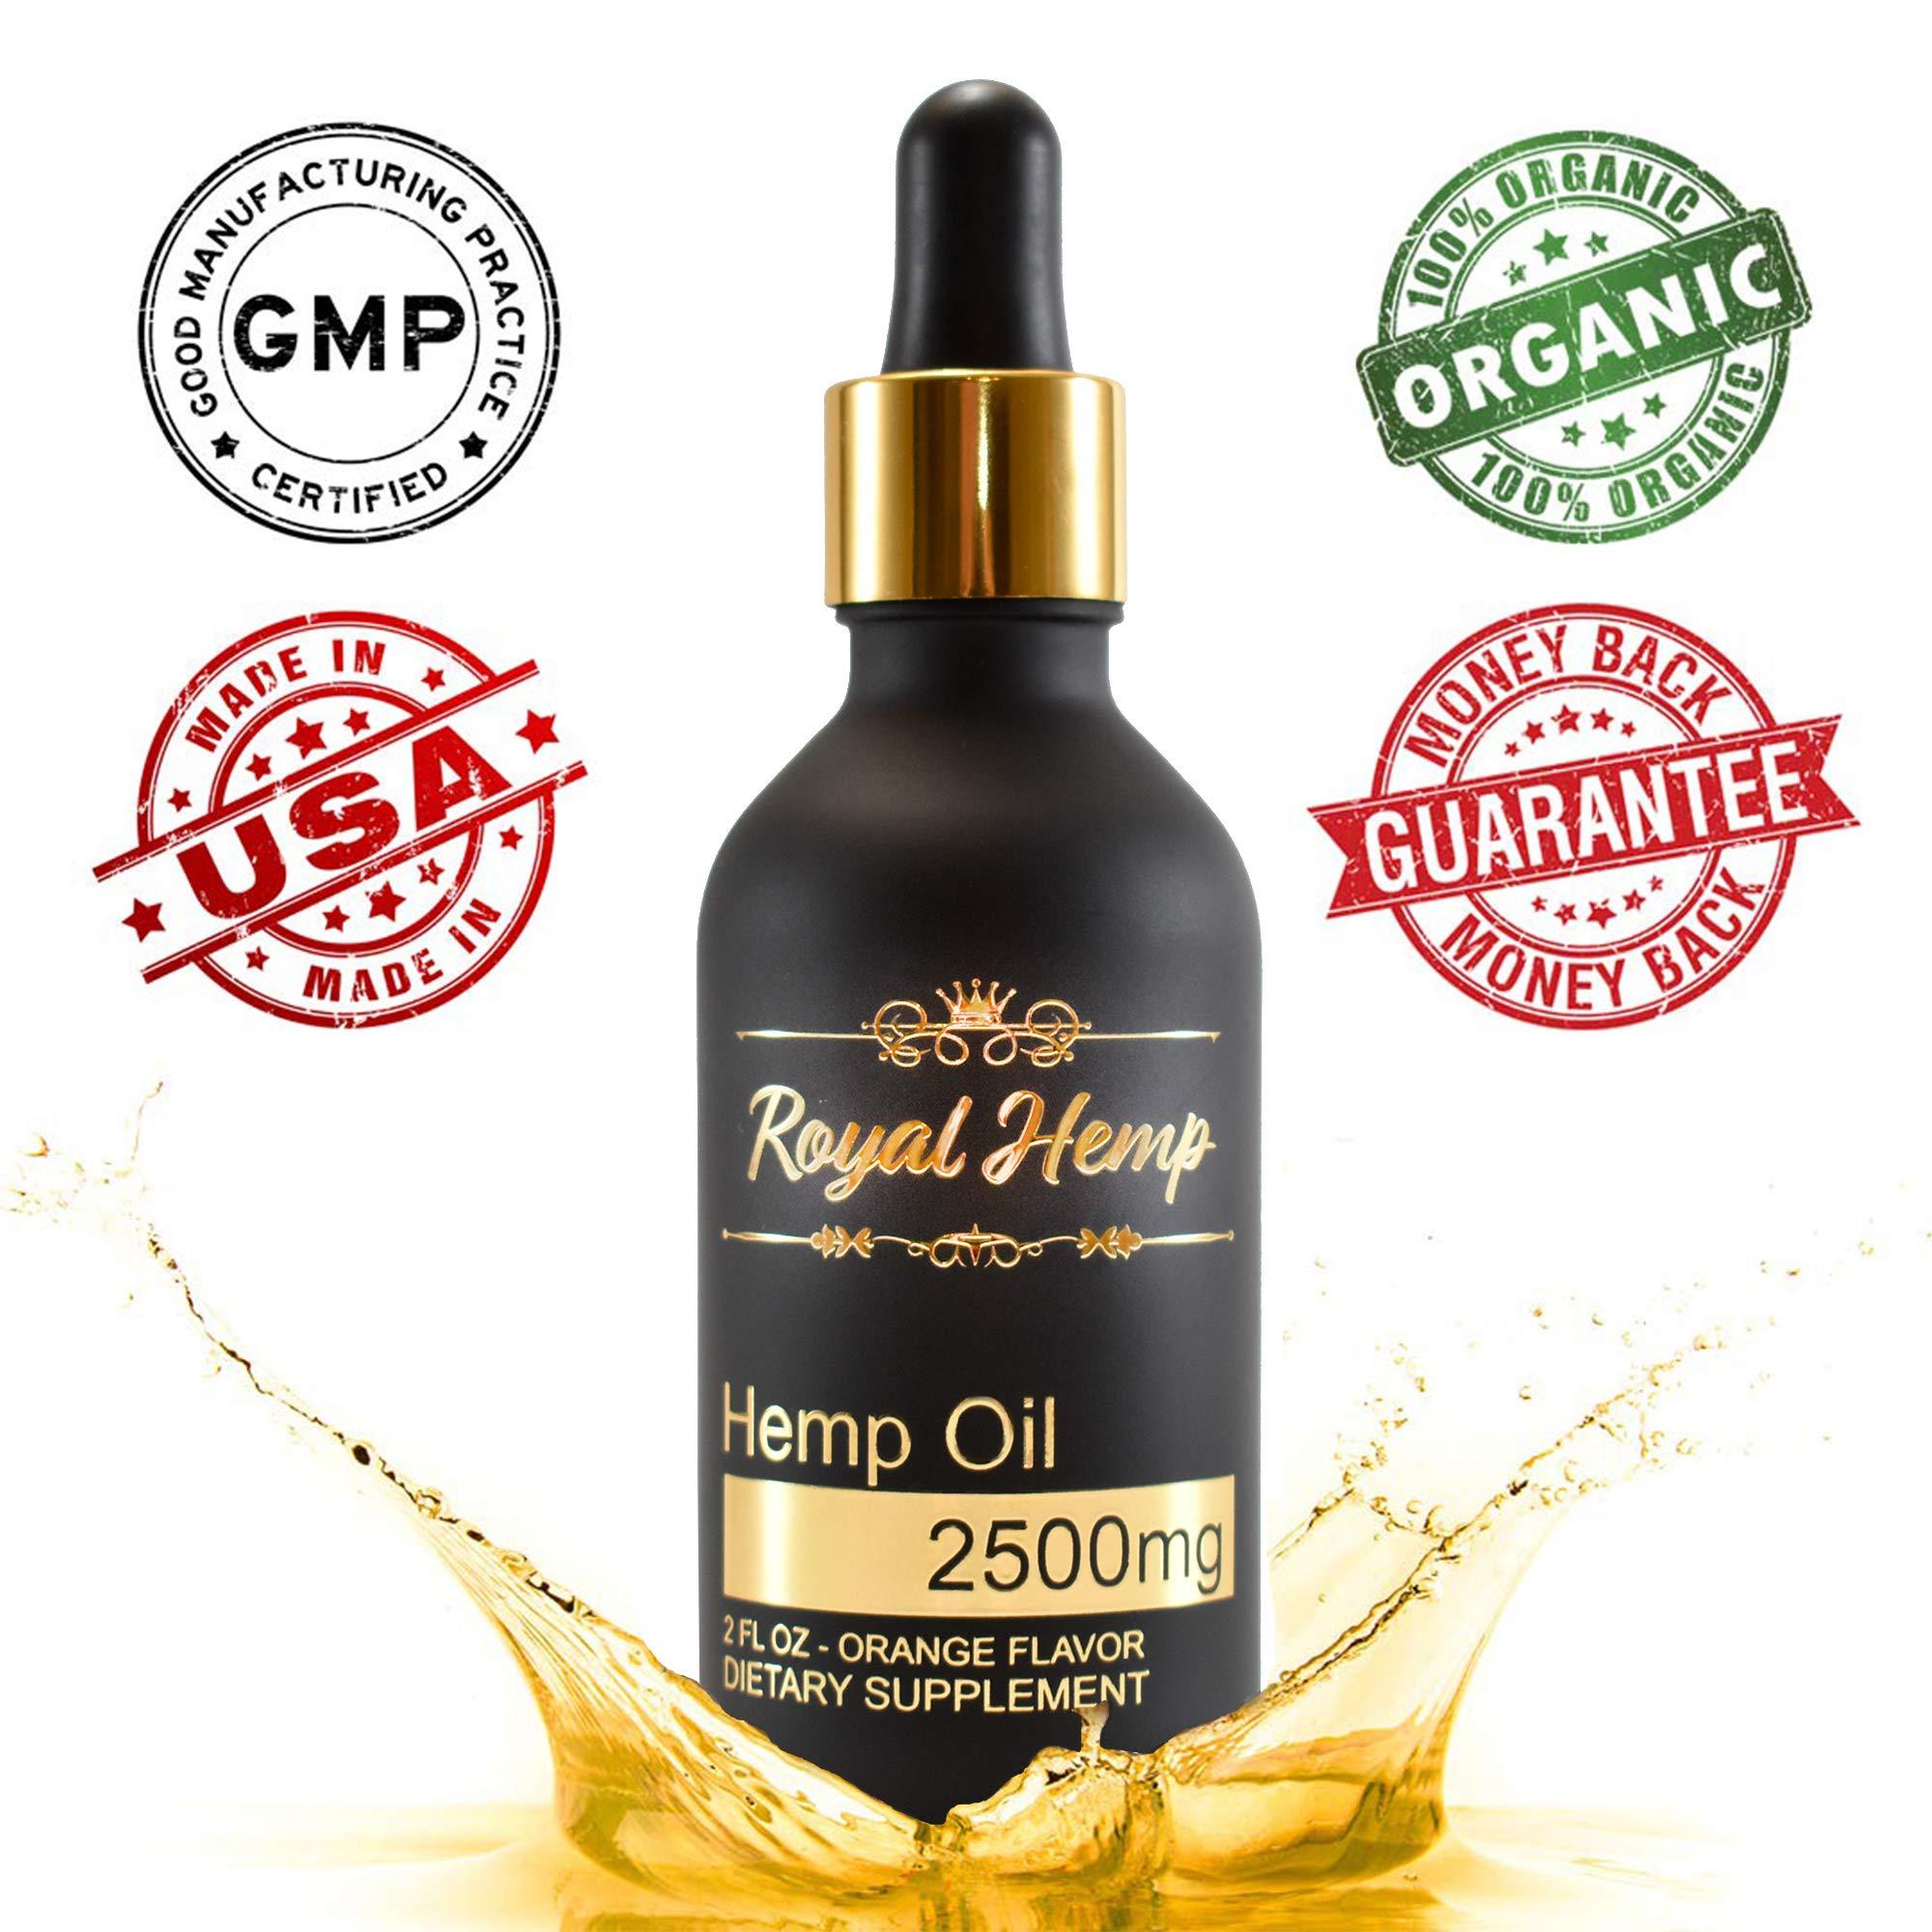 Royal Hemp - Hemp Oil for Pain & Anxiety Relief - 2500mg - Organic Hemp Drops - Natural Hemp Oils for Better Sleep, Mood & Stress - Pure Hemp Extract - Orange Flavor